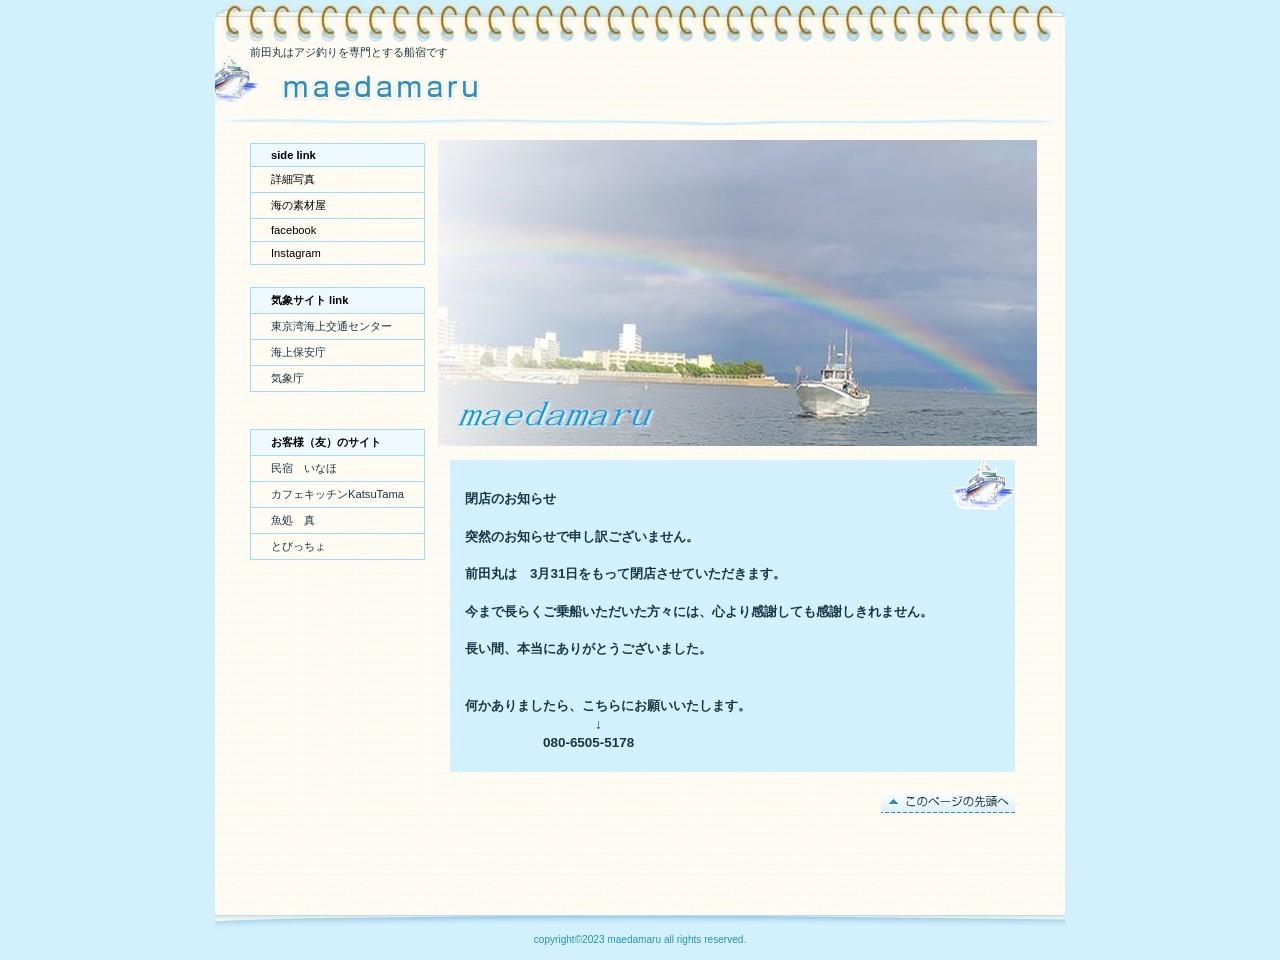 http://www.maedamaru.sakura.ne.jp/keyword.html